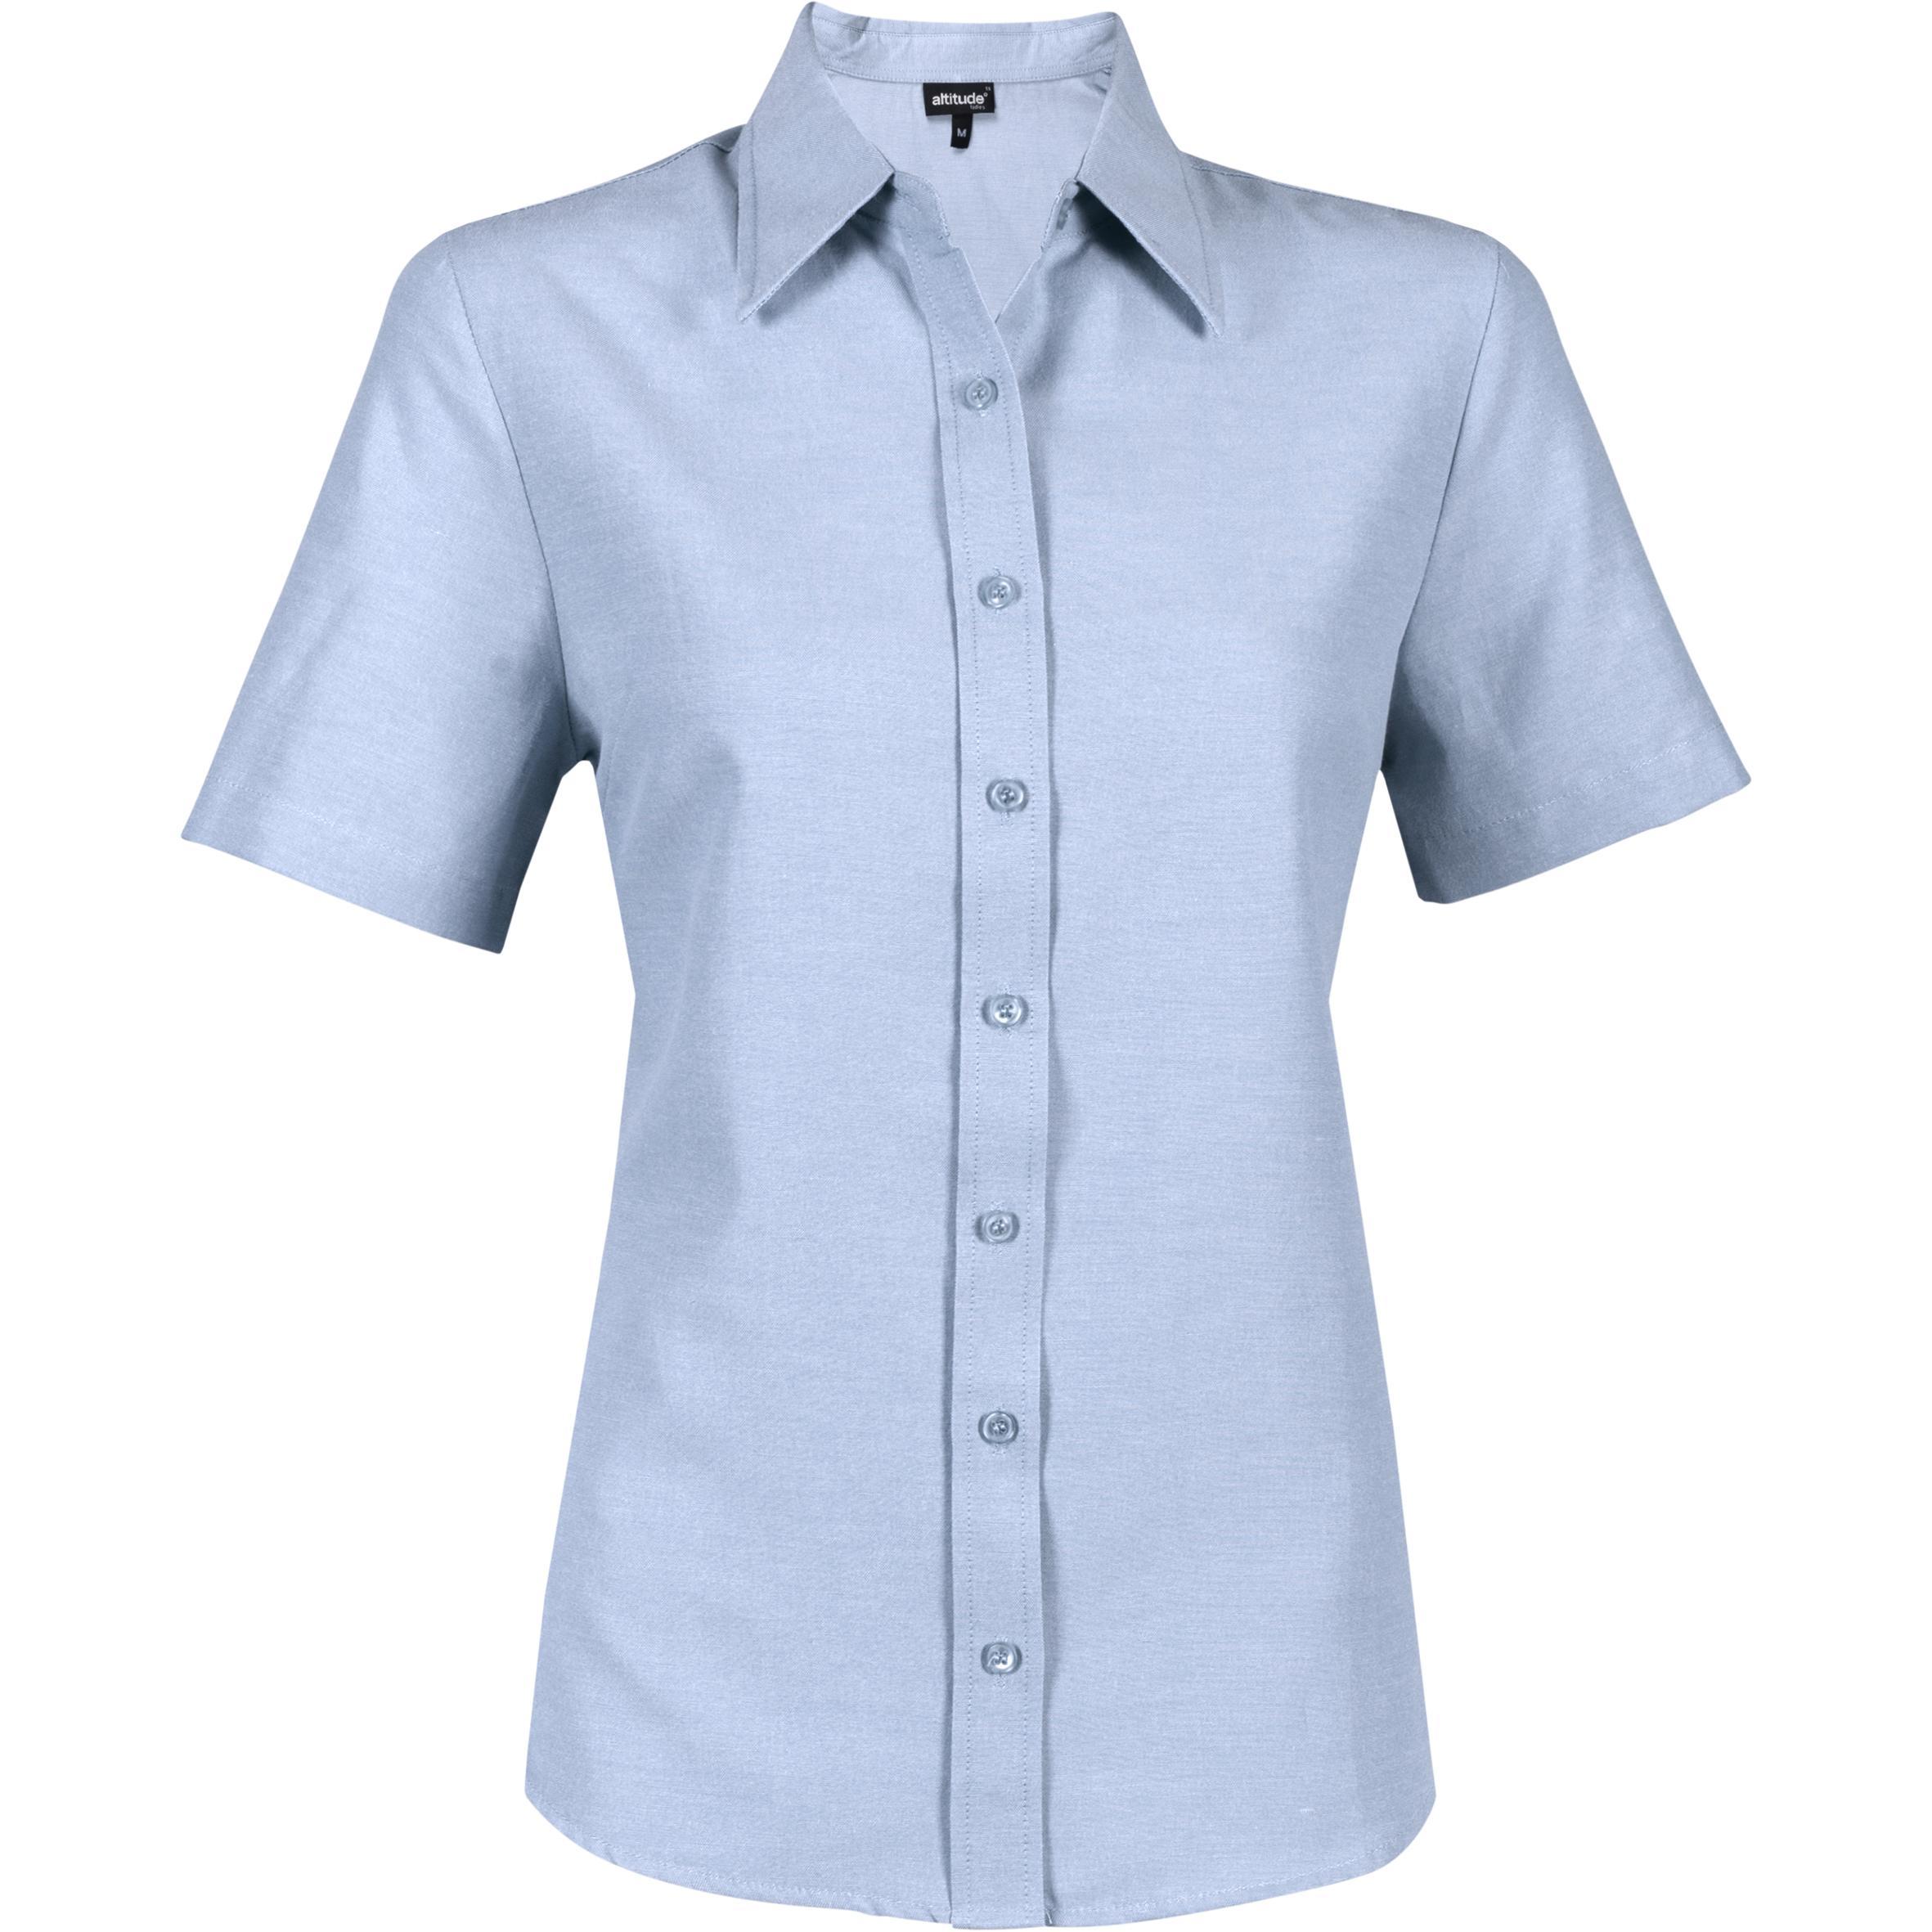 Ladies Short Sleeve Oxford Shirt - Light Blue Only